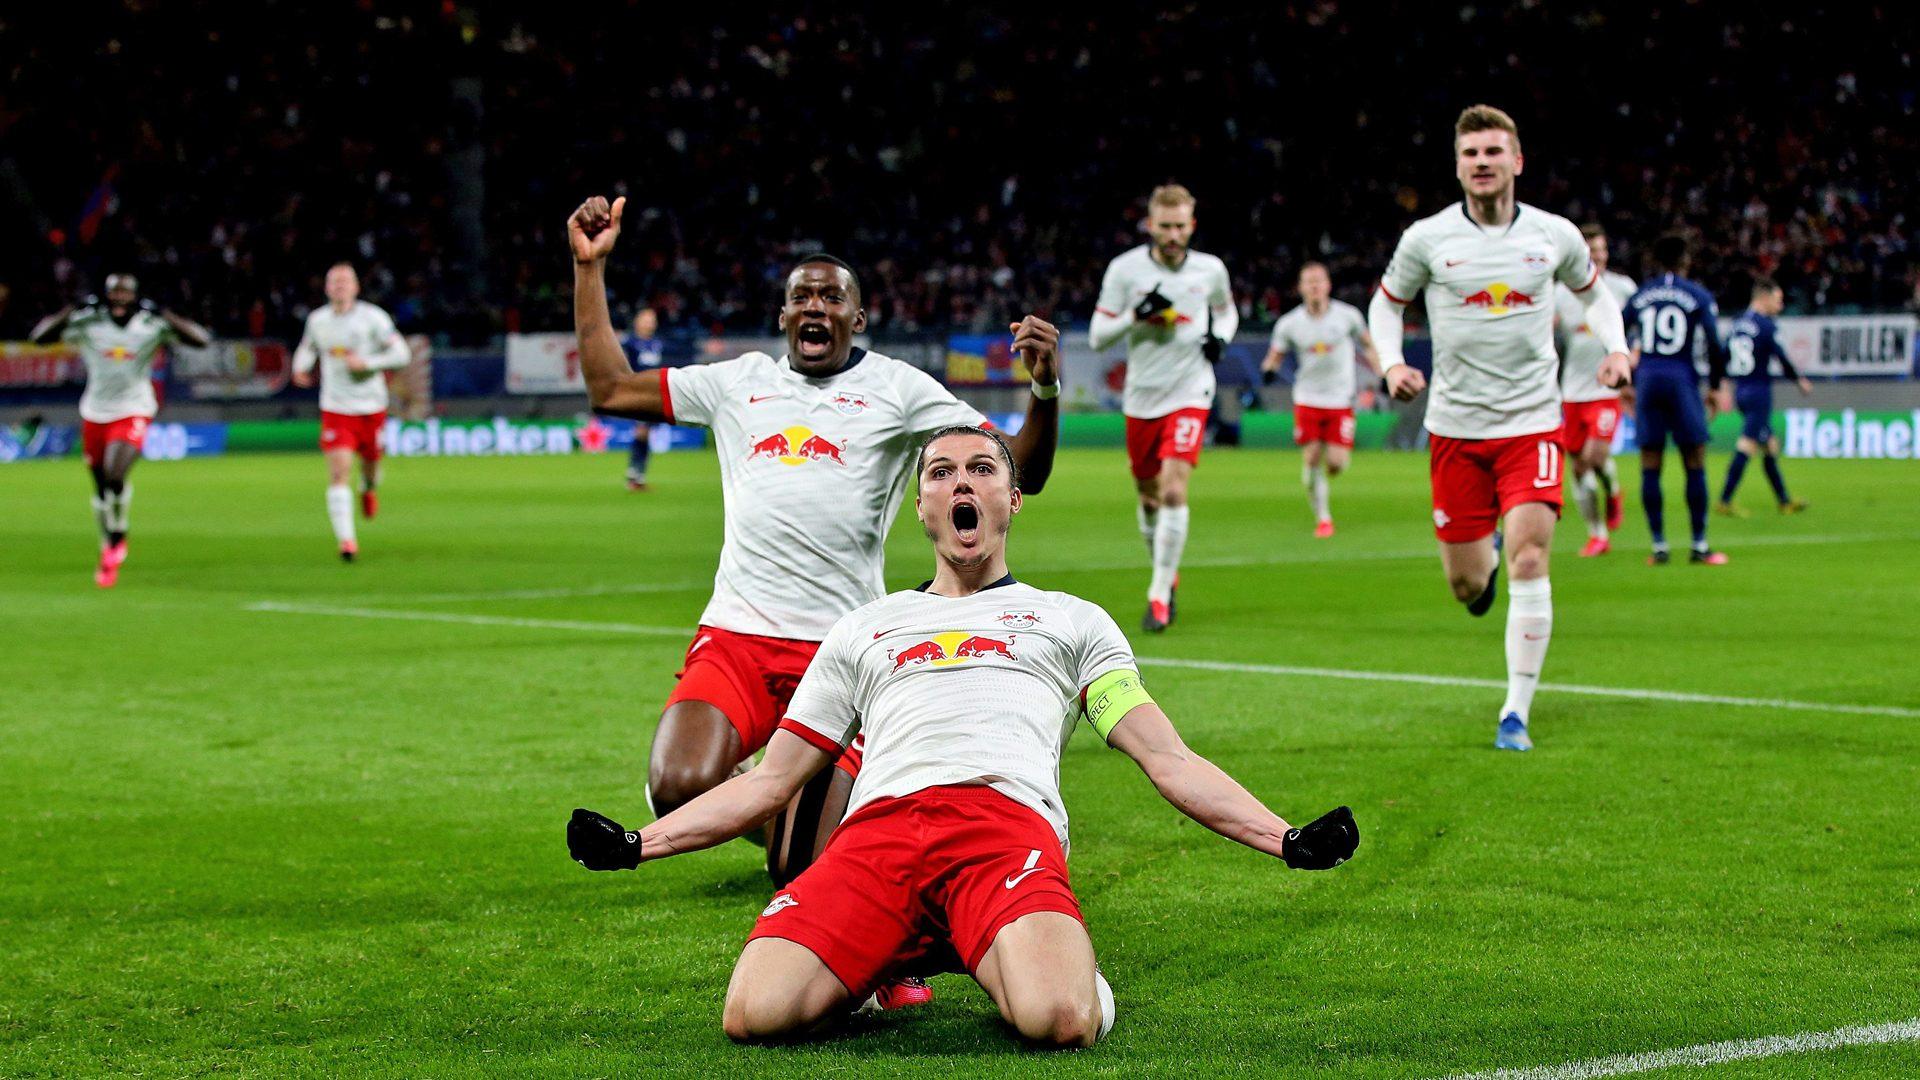 TICKET UEFA Champions League 2019//20 RB Leipzig Tottenham Hotspur Spurs